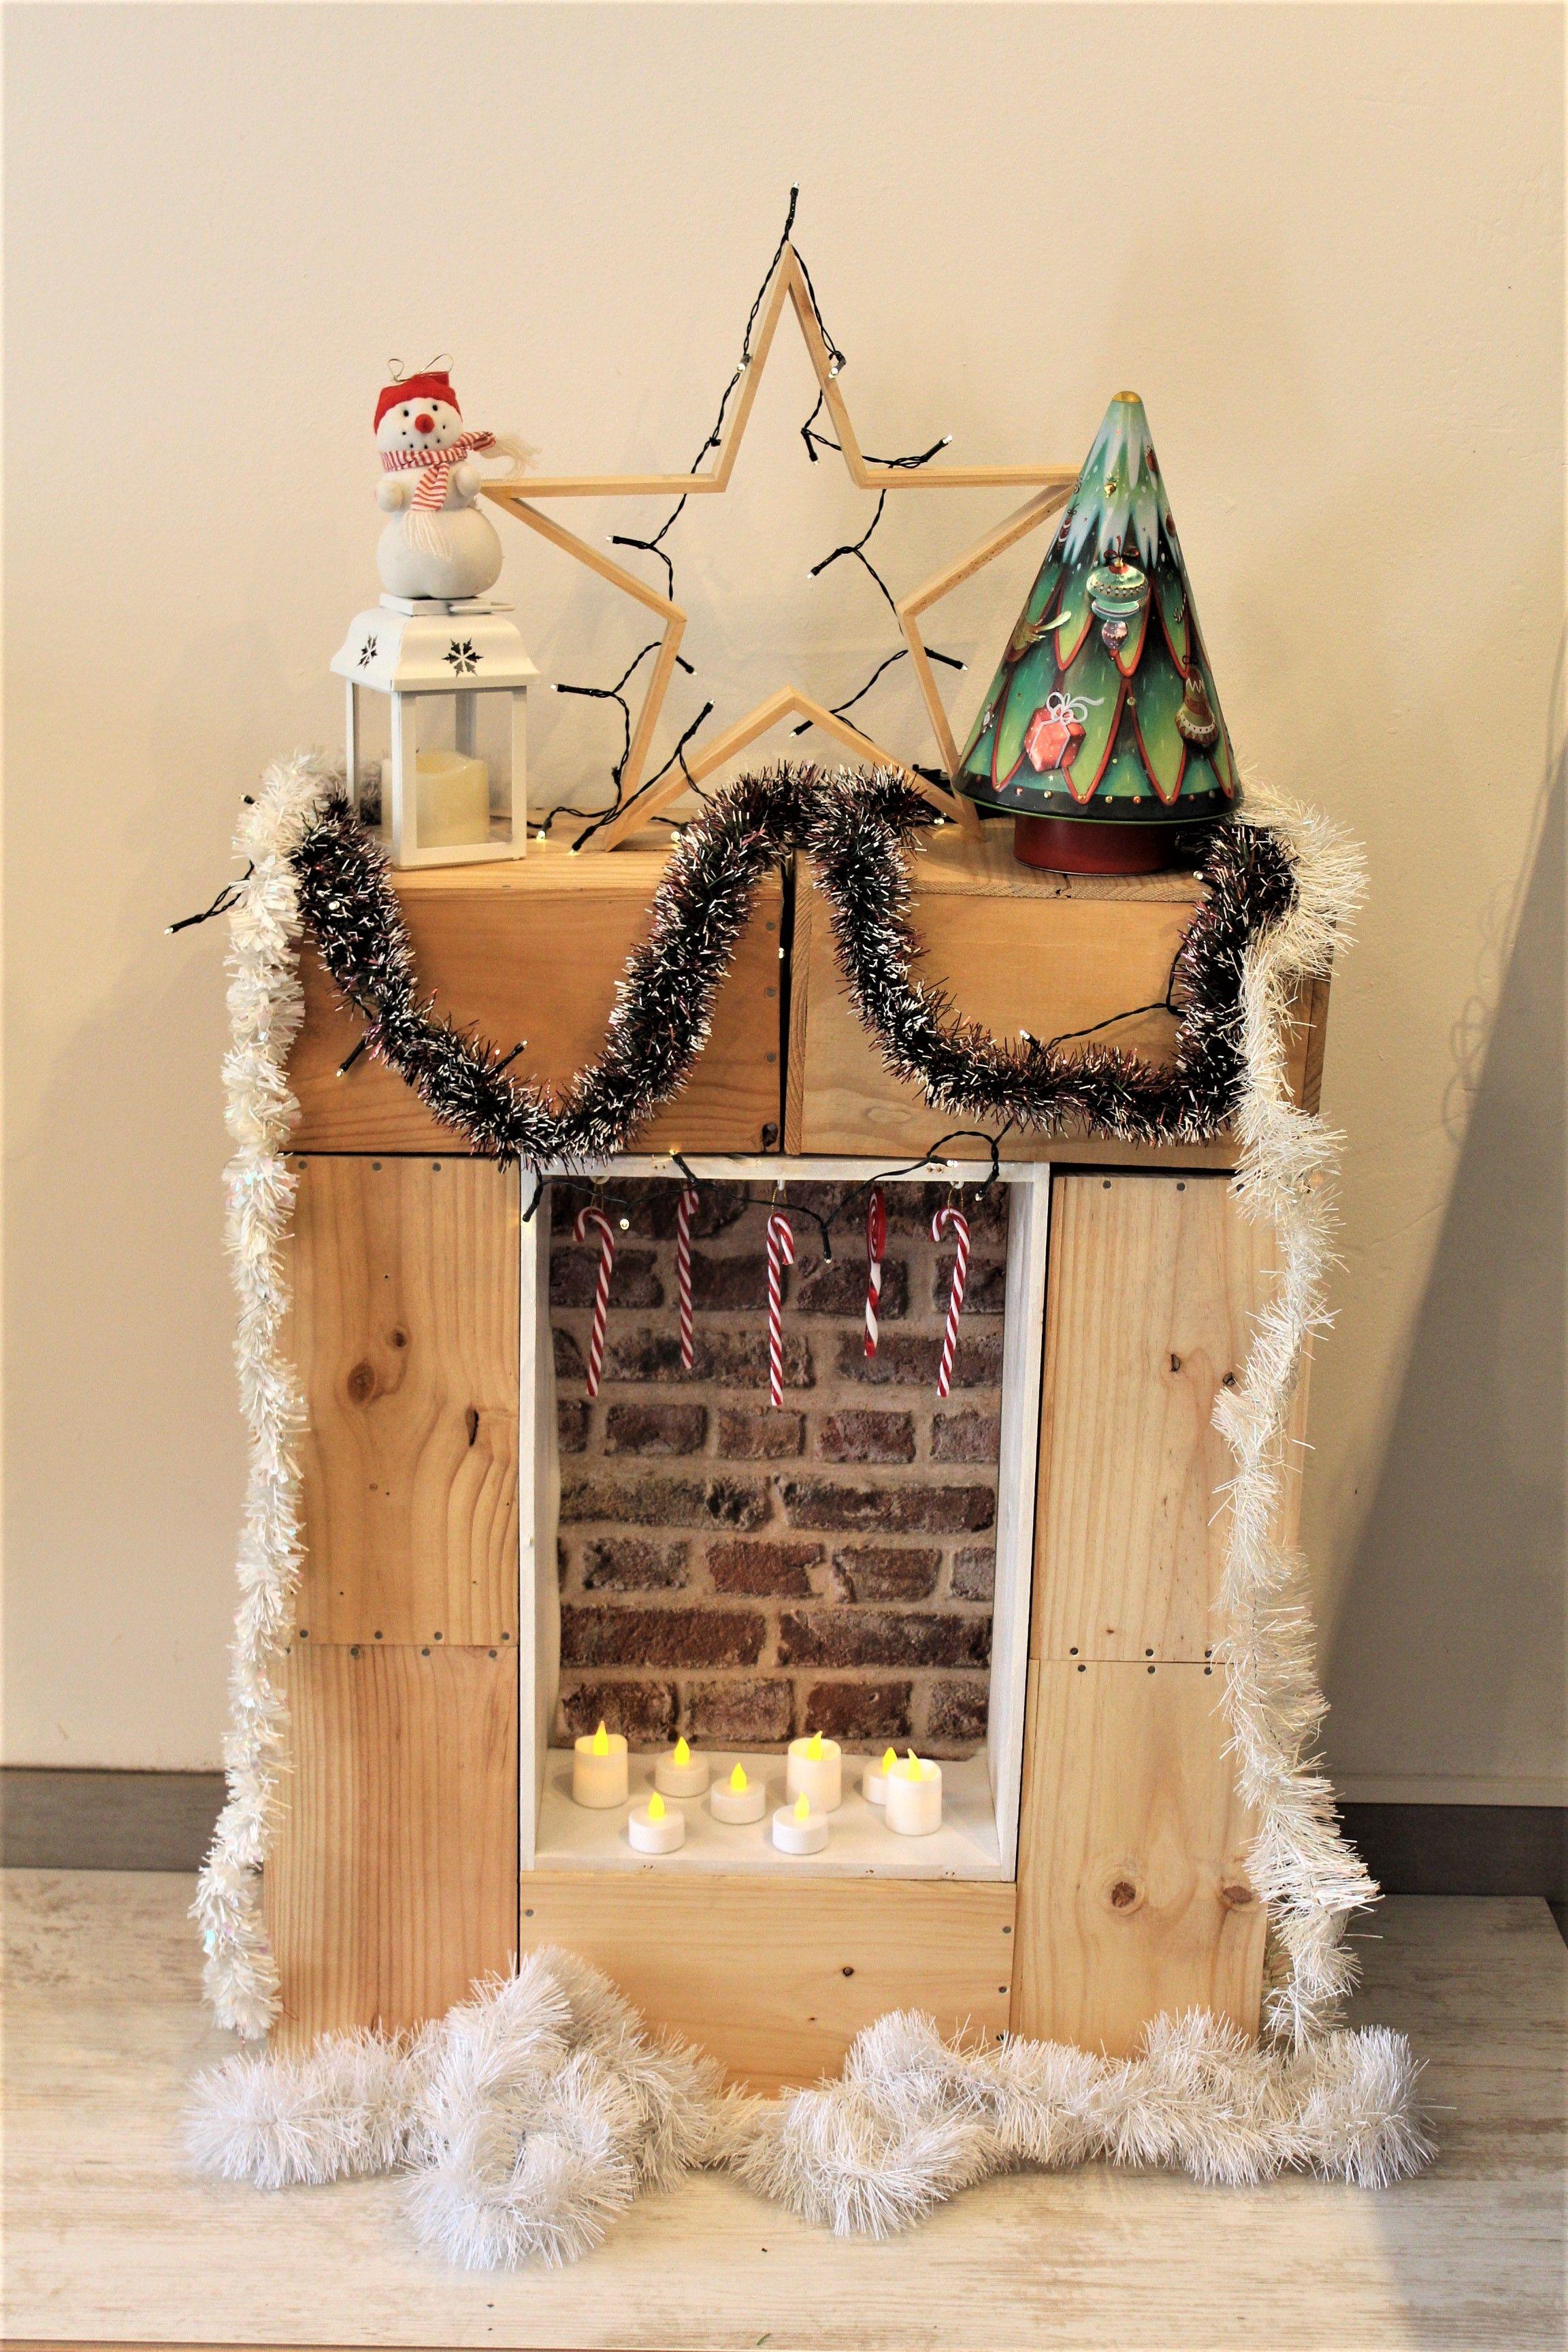 Cheminee Decoration Noel Christmas Fireplace Home Hygge Wine Box